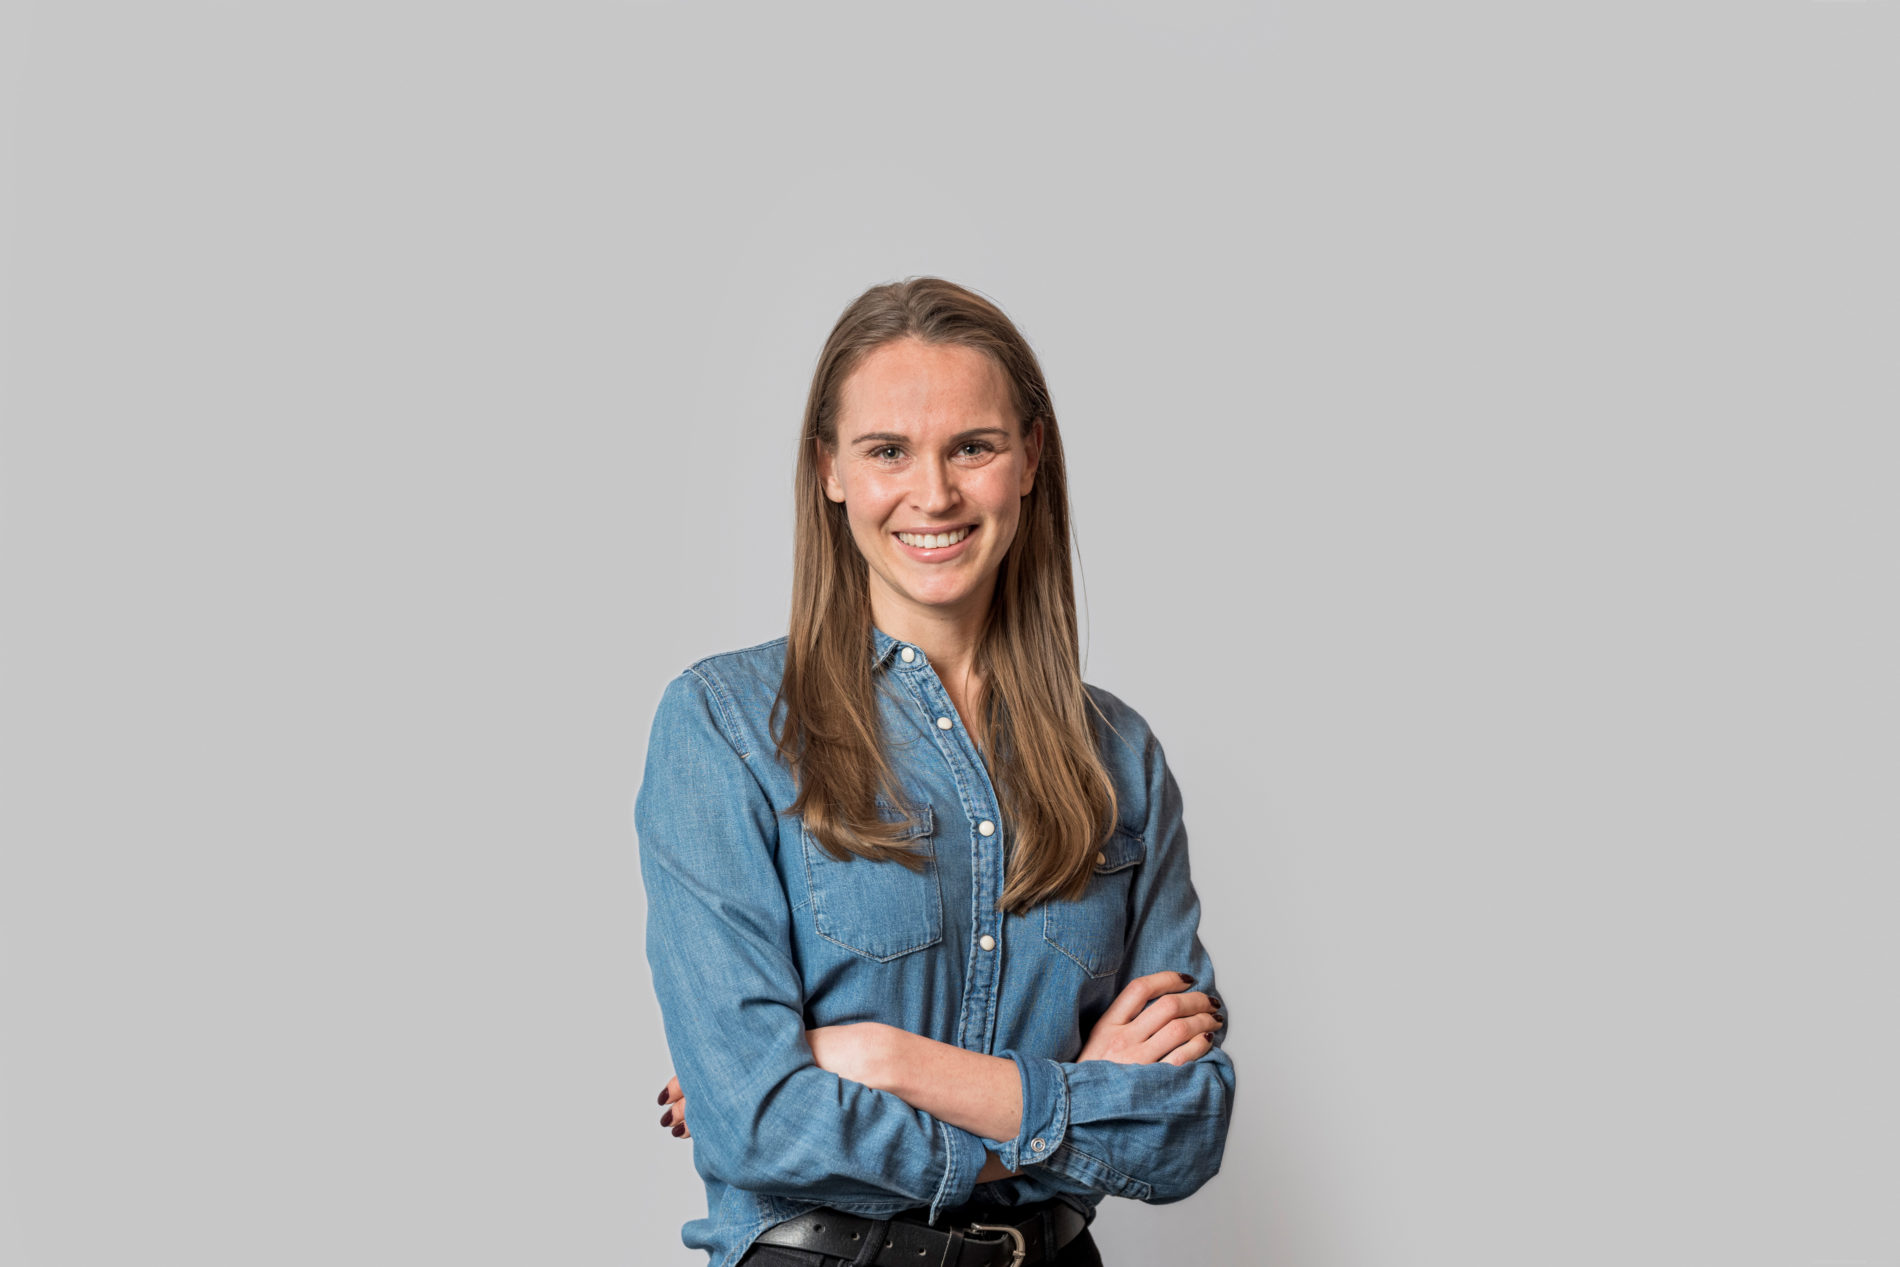 Mikaela Hammarström